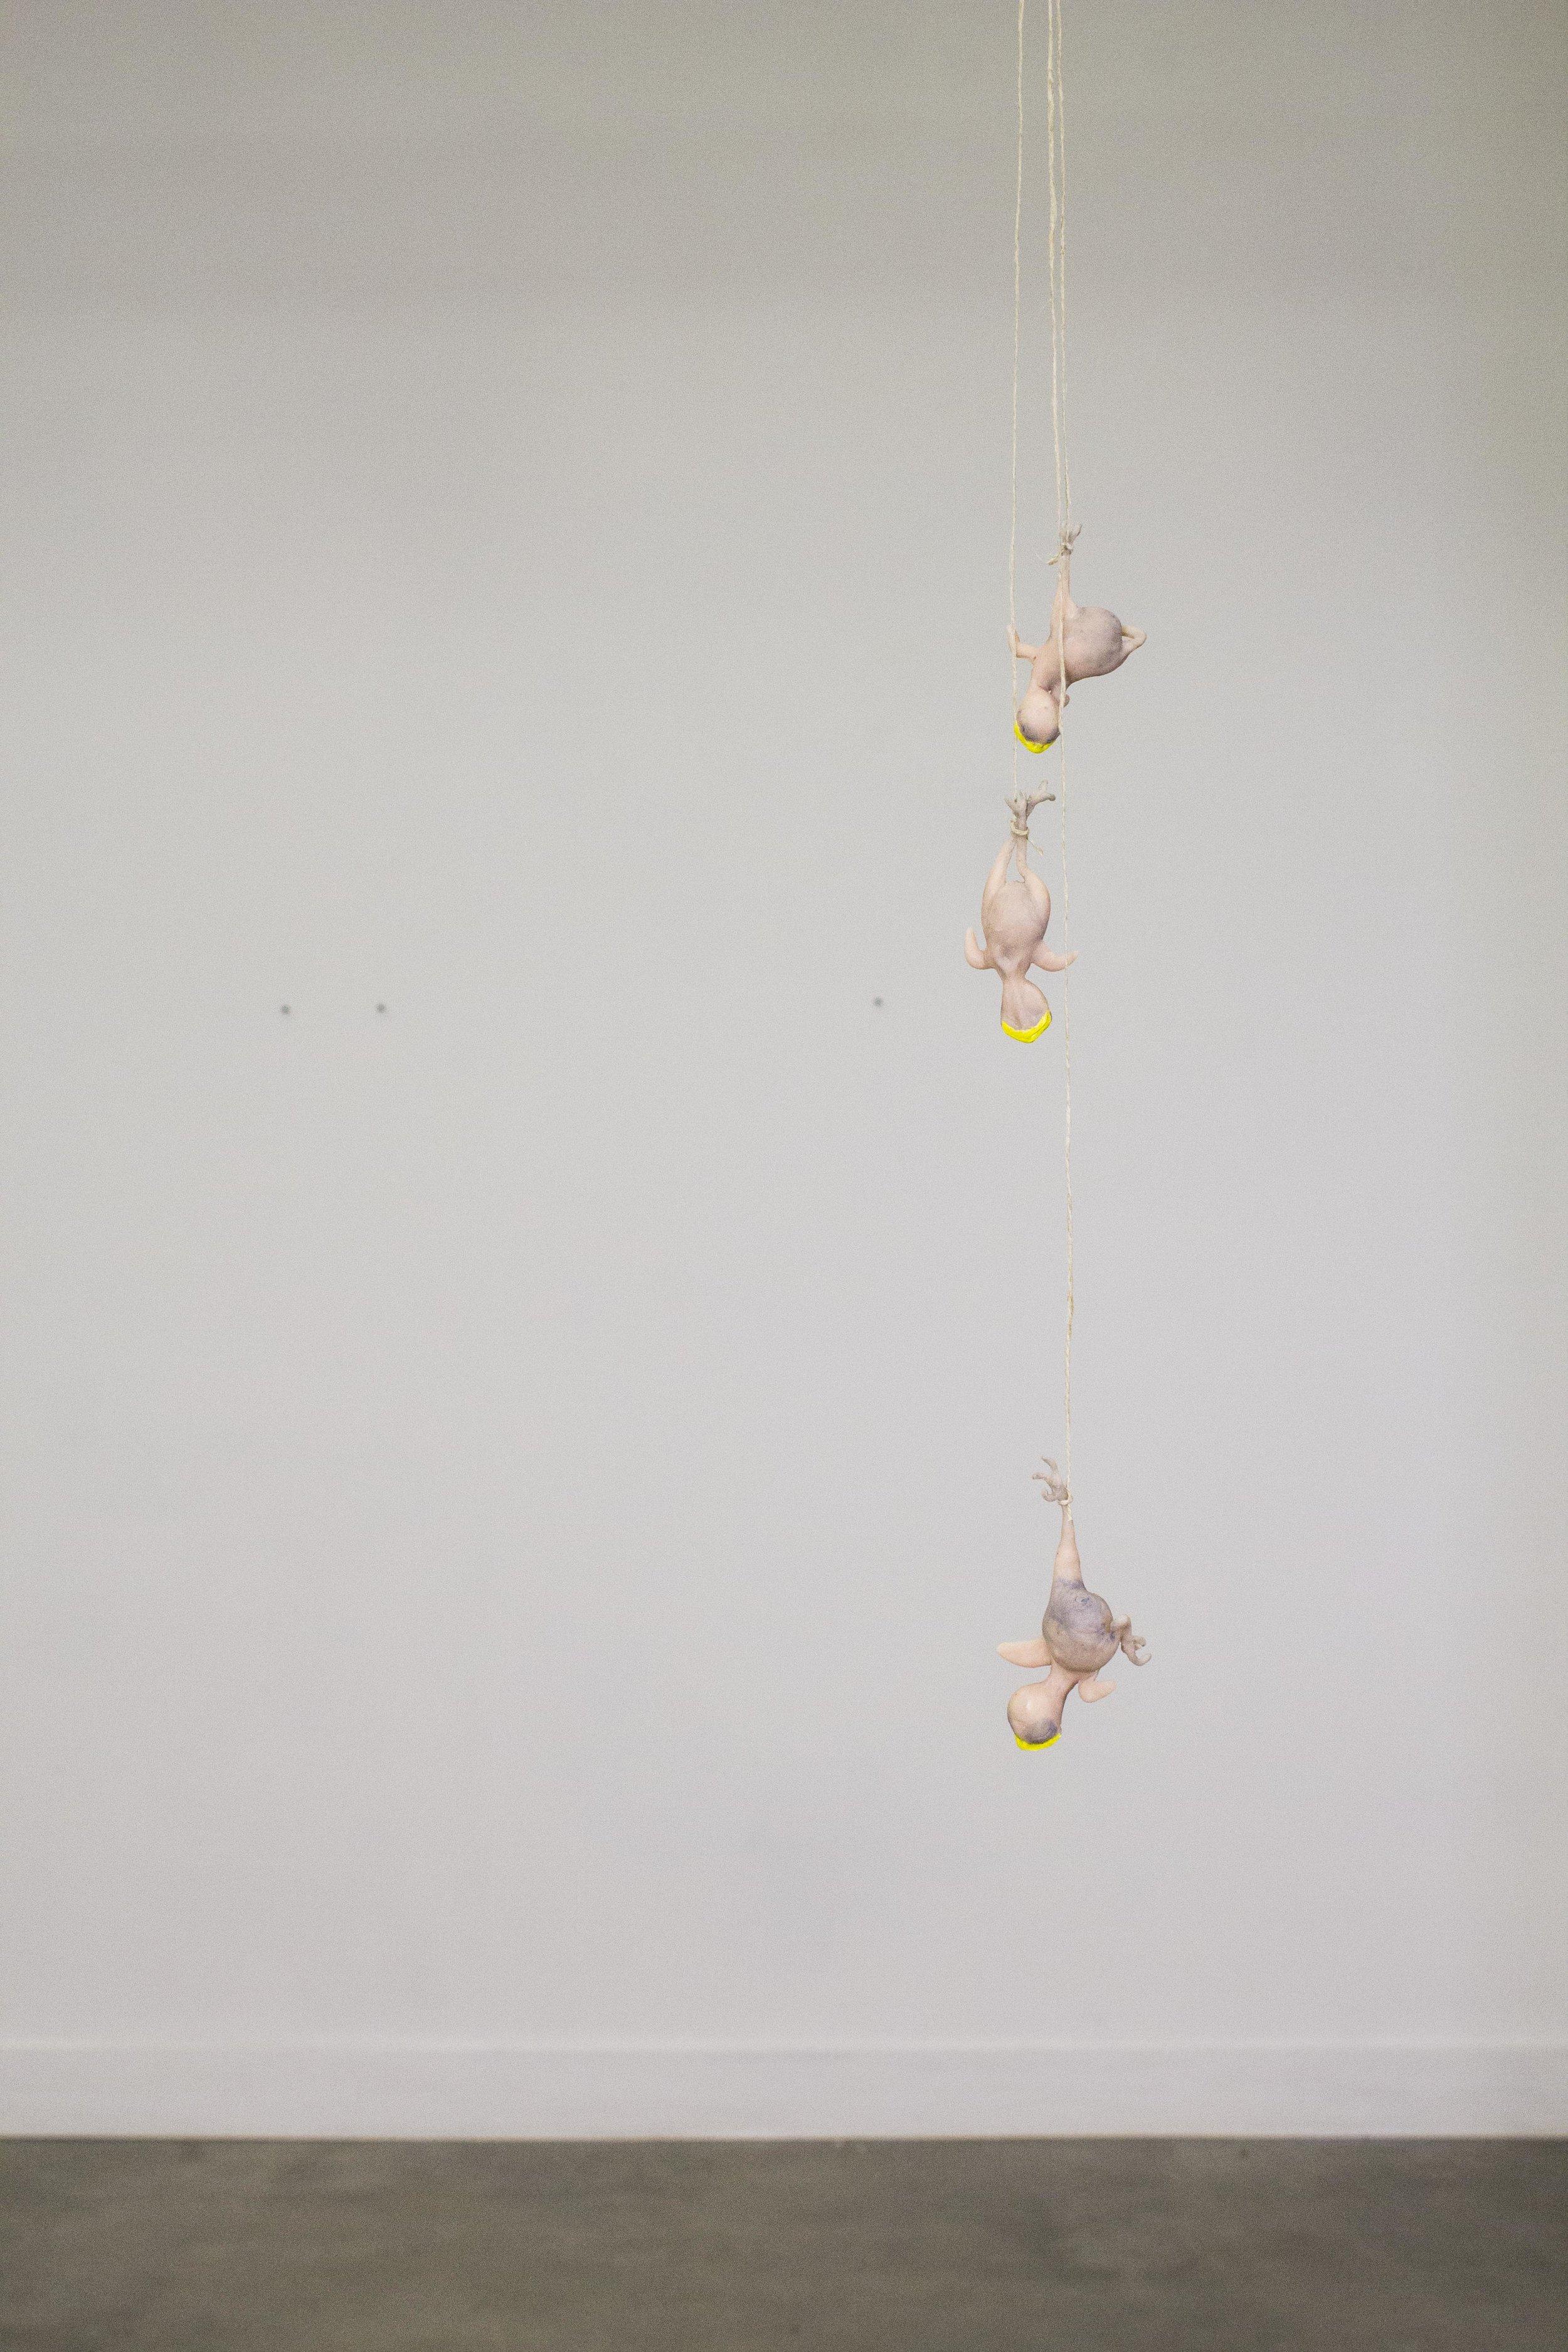 Meagan-Hindel-Sculpture-BabyBird3.jpg